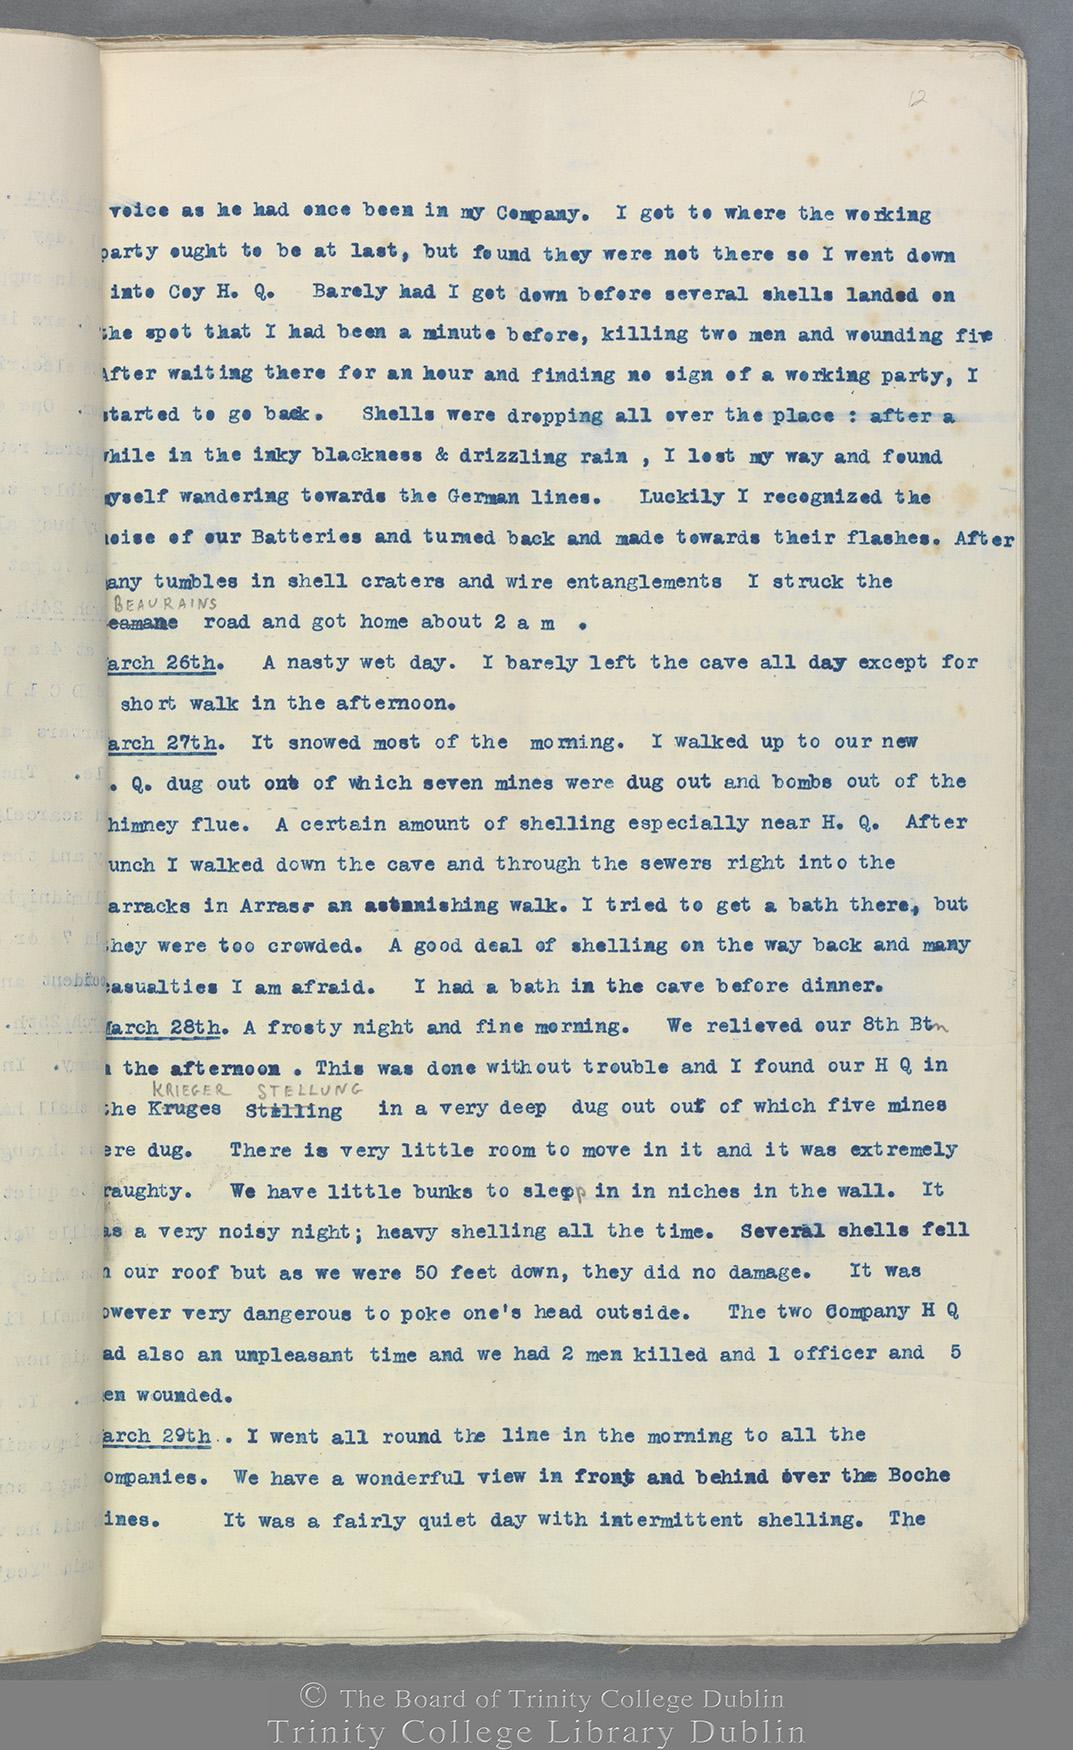 TCD MS 10822 folio 12 recto